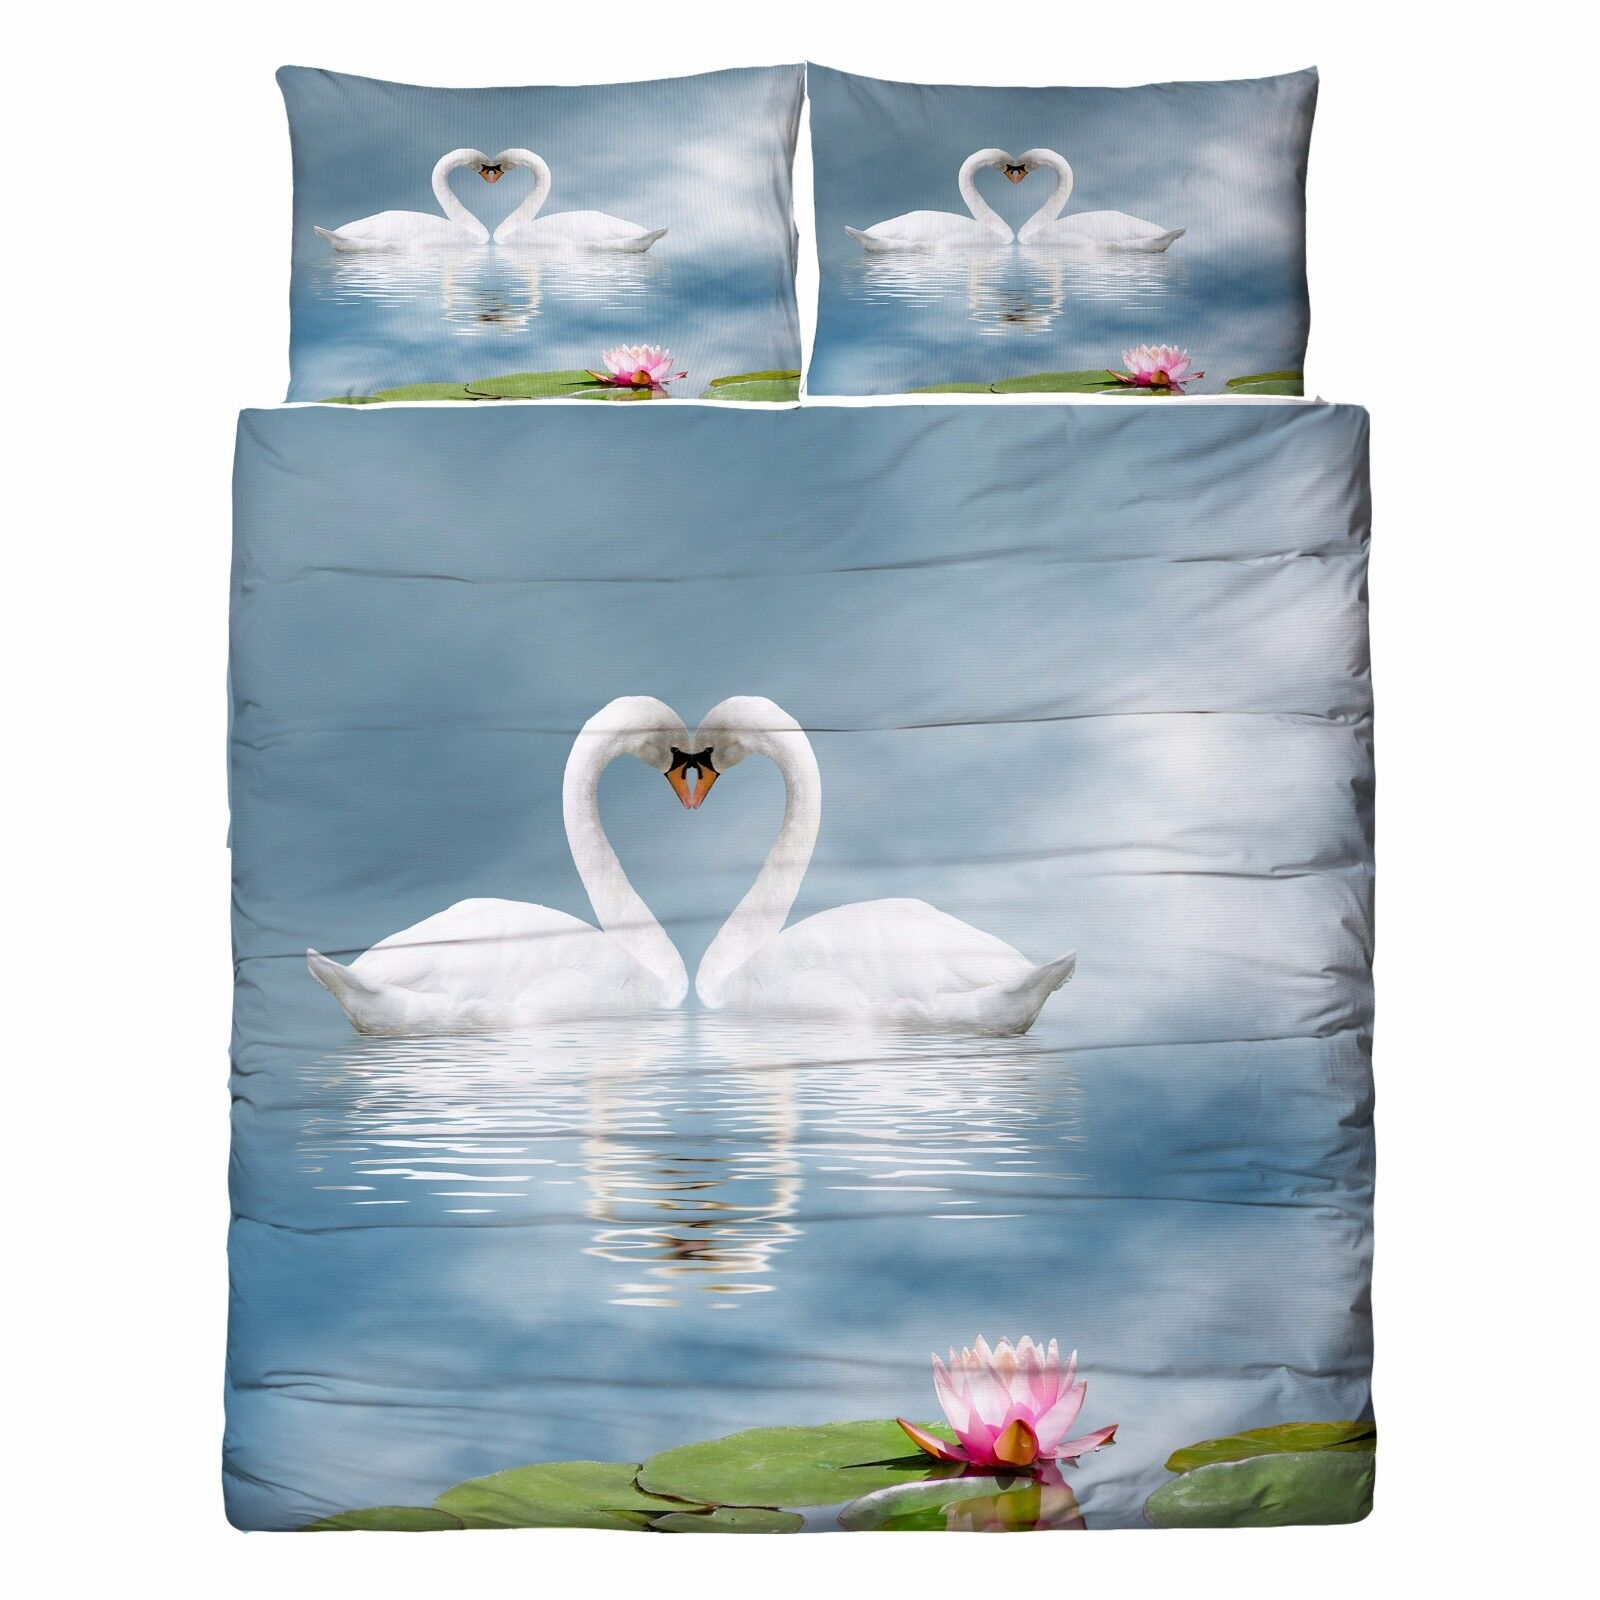 3D Swan River Sky 806 Bed Pillowcases Quilt Duvet Cover Set Single Queen UK Kyra